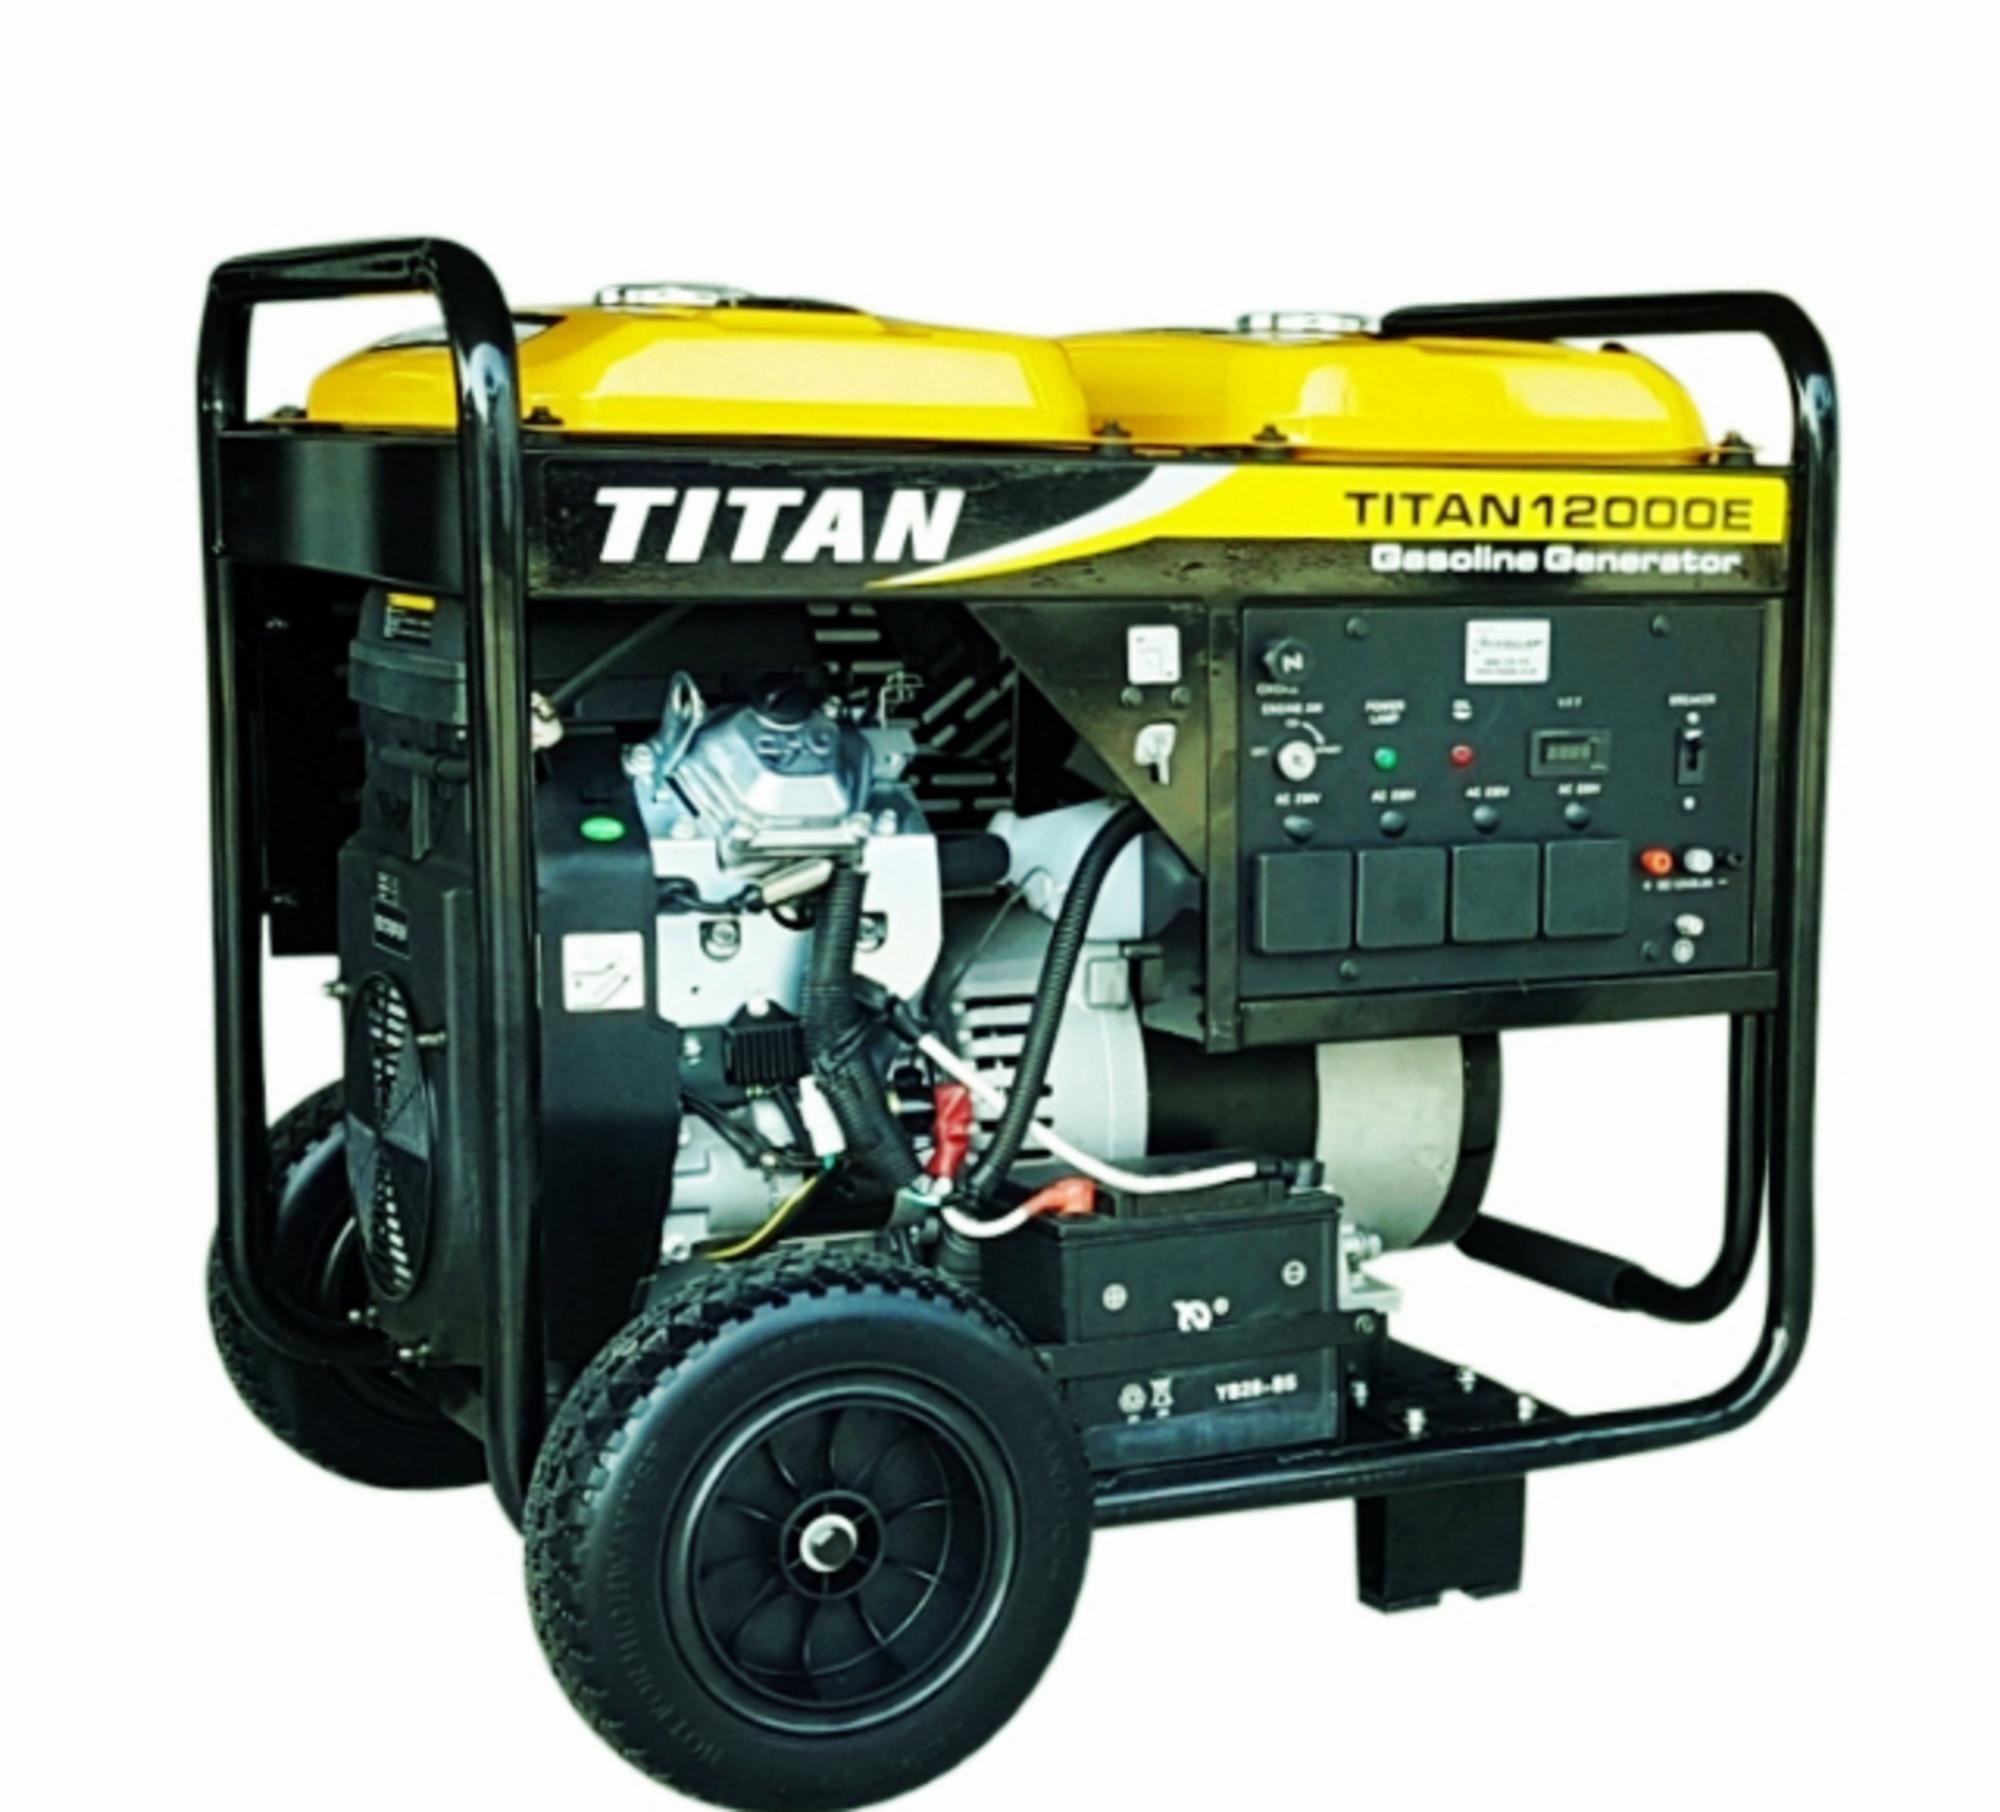 Titan 12000E 11kW Petrol Generator